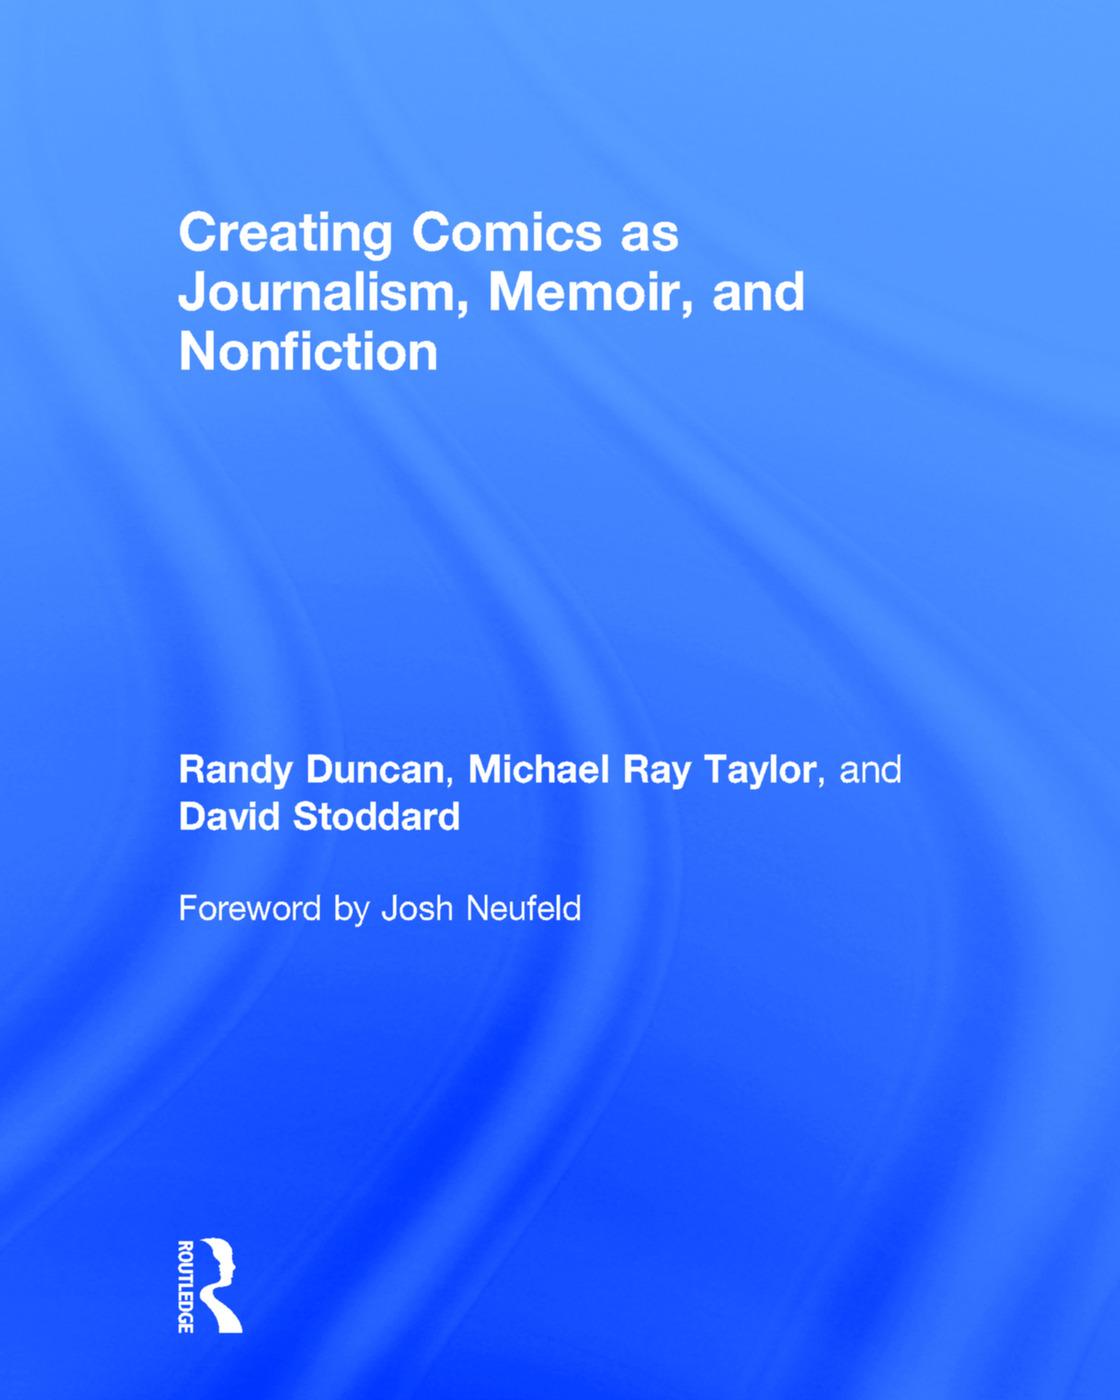 Creating Comics as Journalism, Memoir and Nonfiction book cover